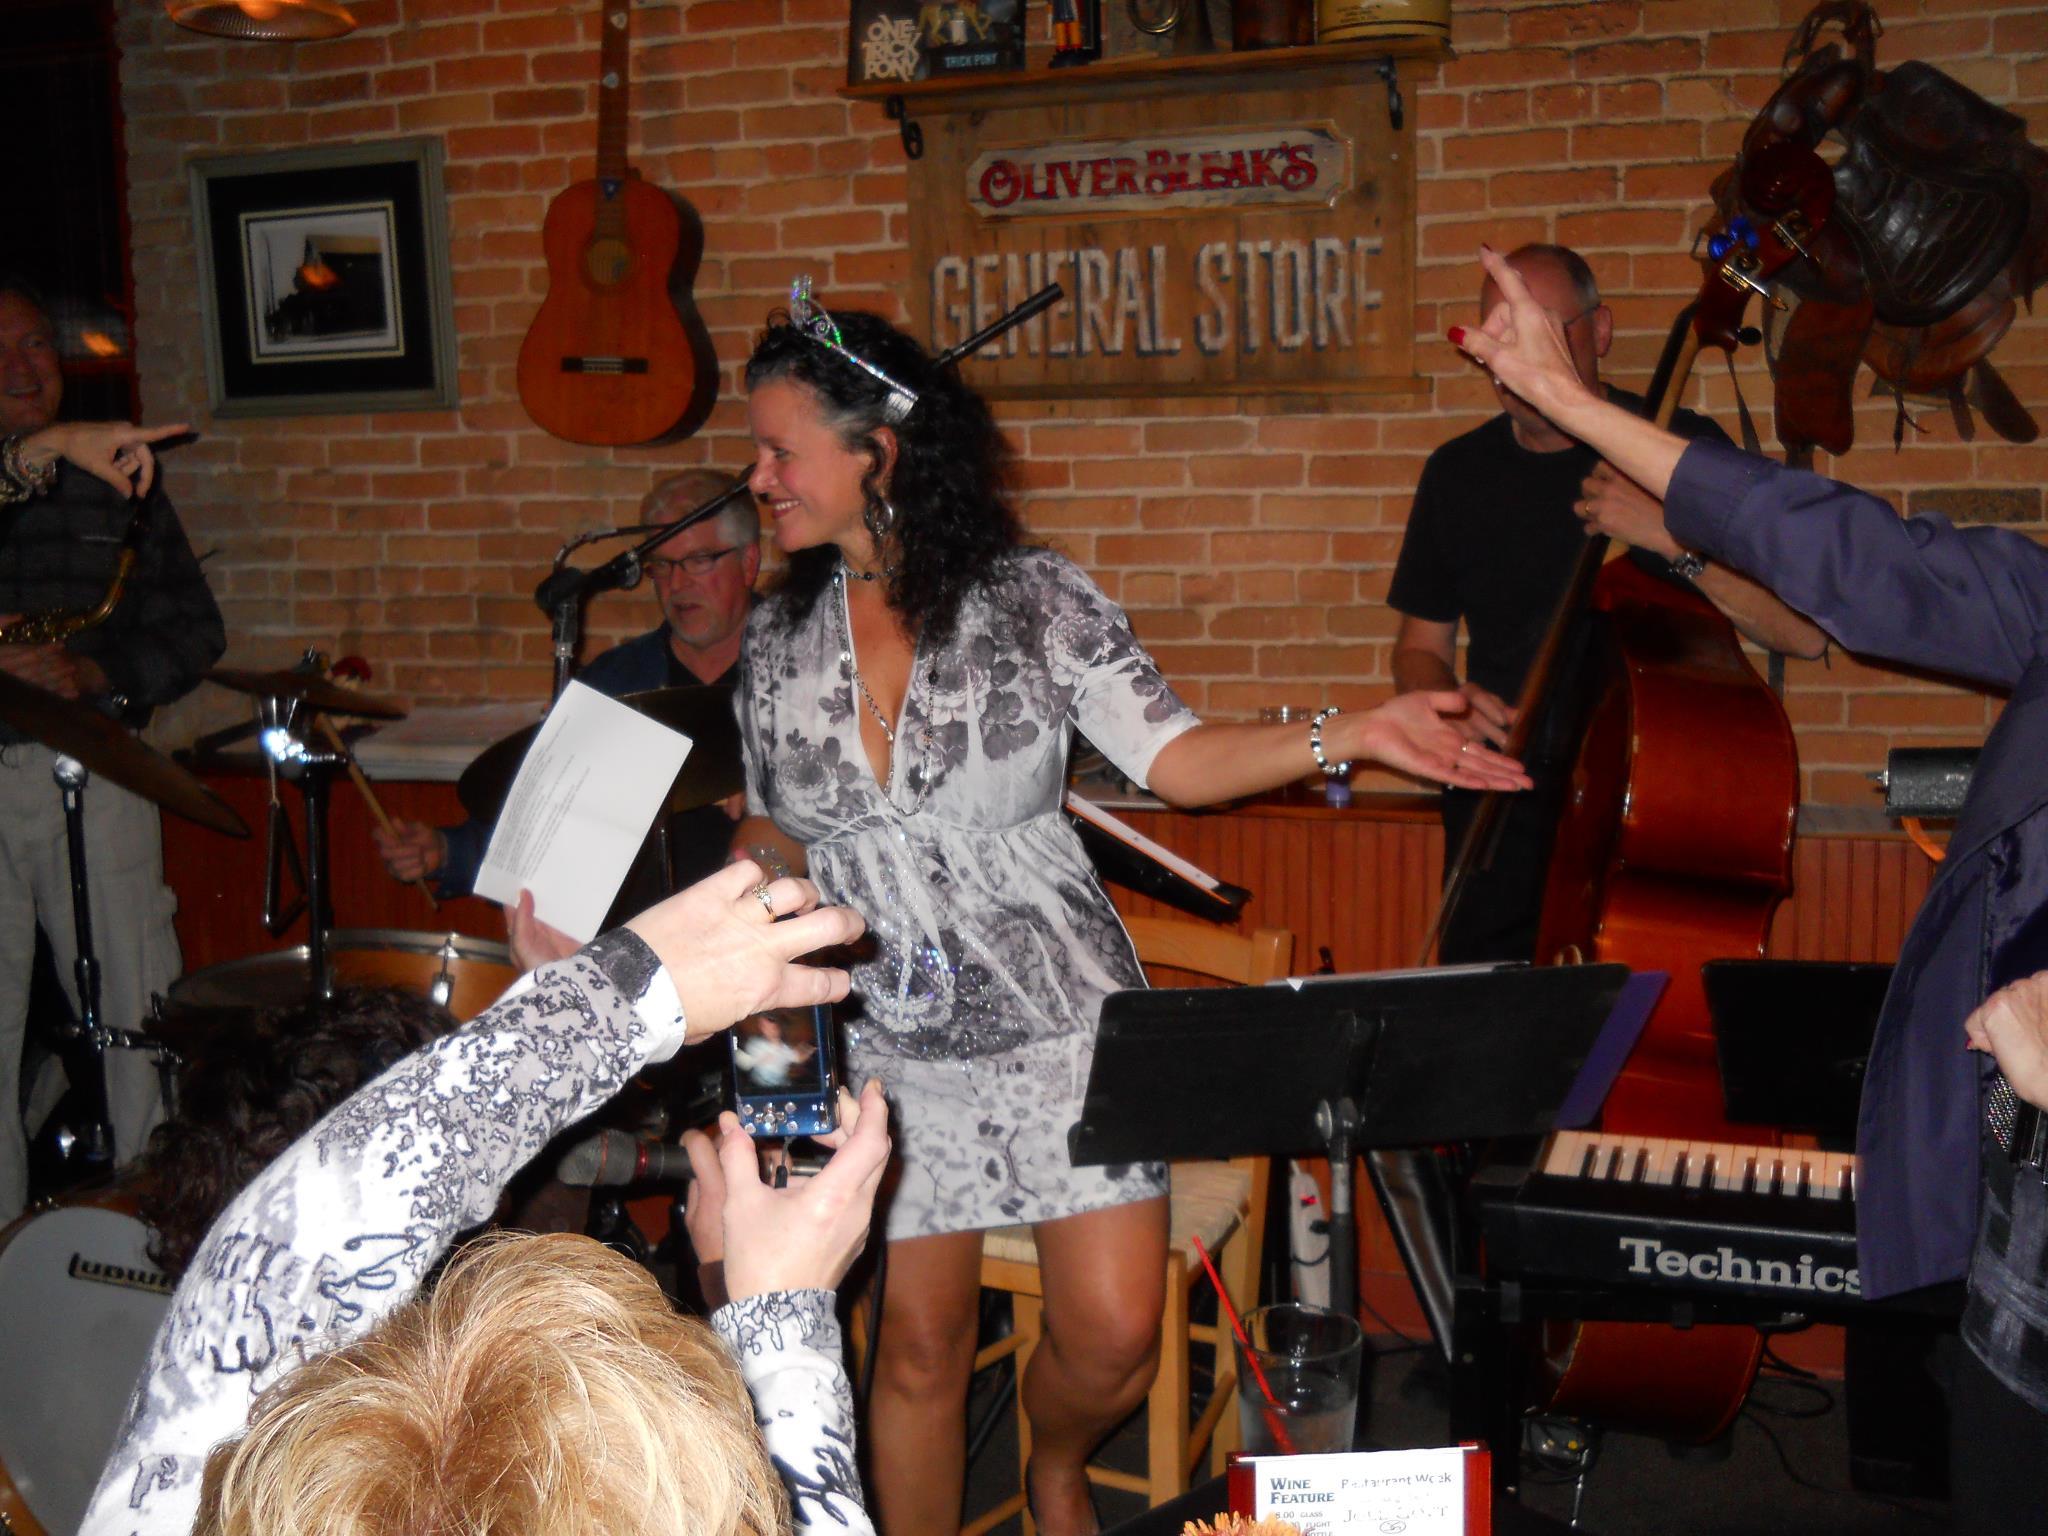 Francesca & Friends Jazz Combo